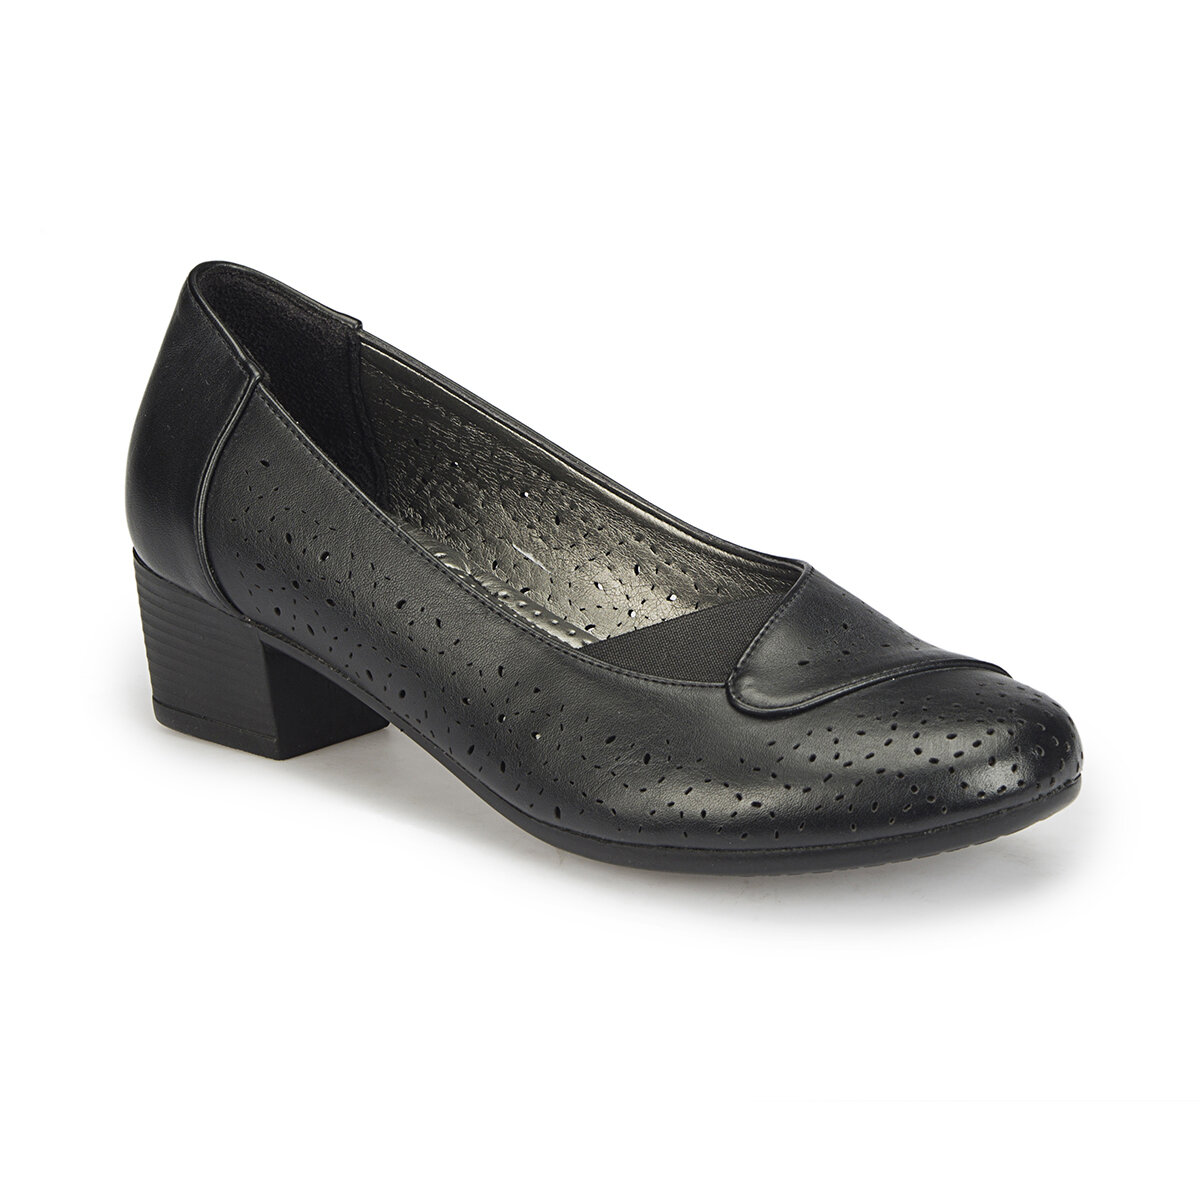 FLO 81. 158499.Z Black Women Gova Shoes Polaris